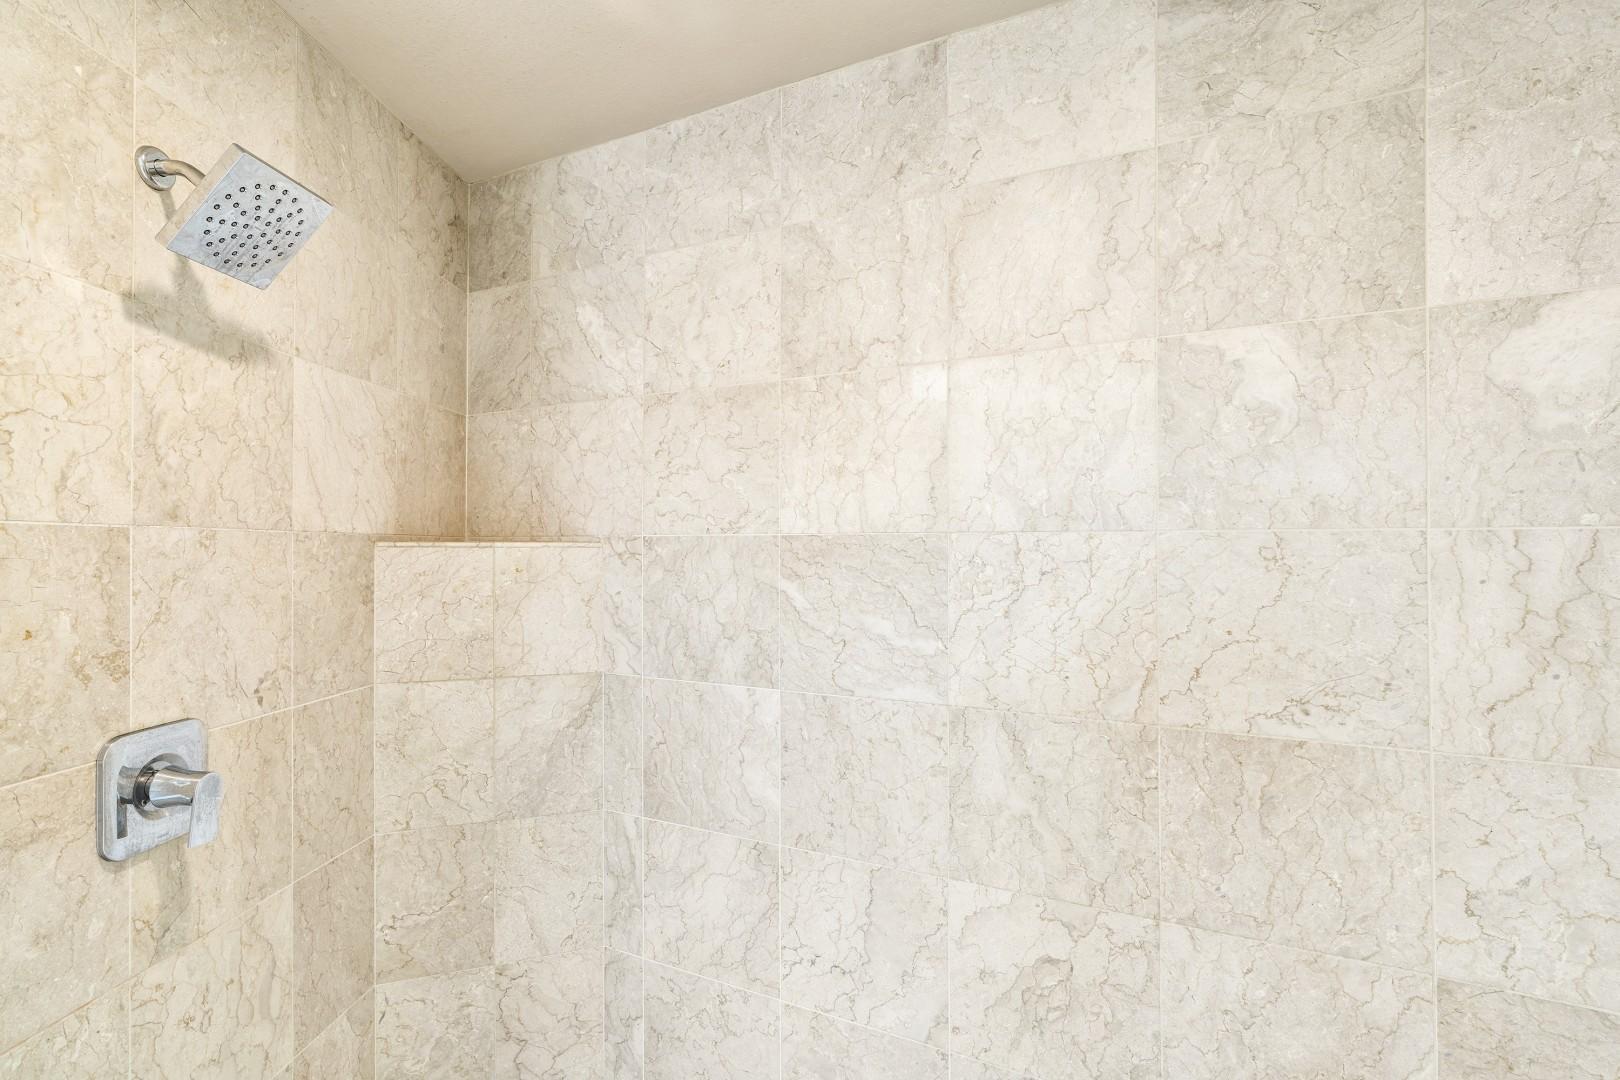 Guest bathroom walk in shower